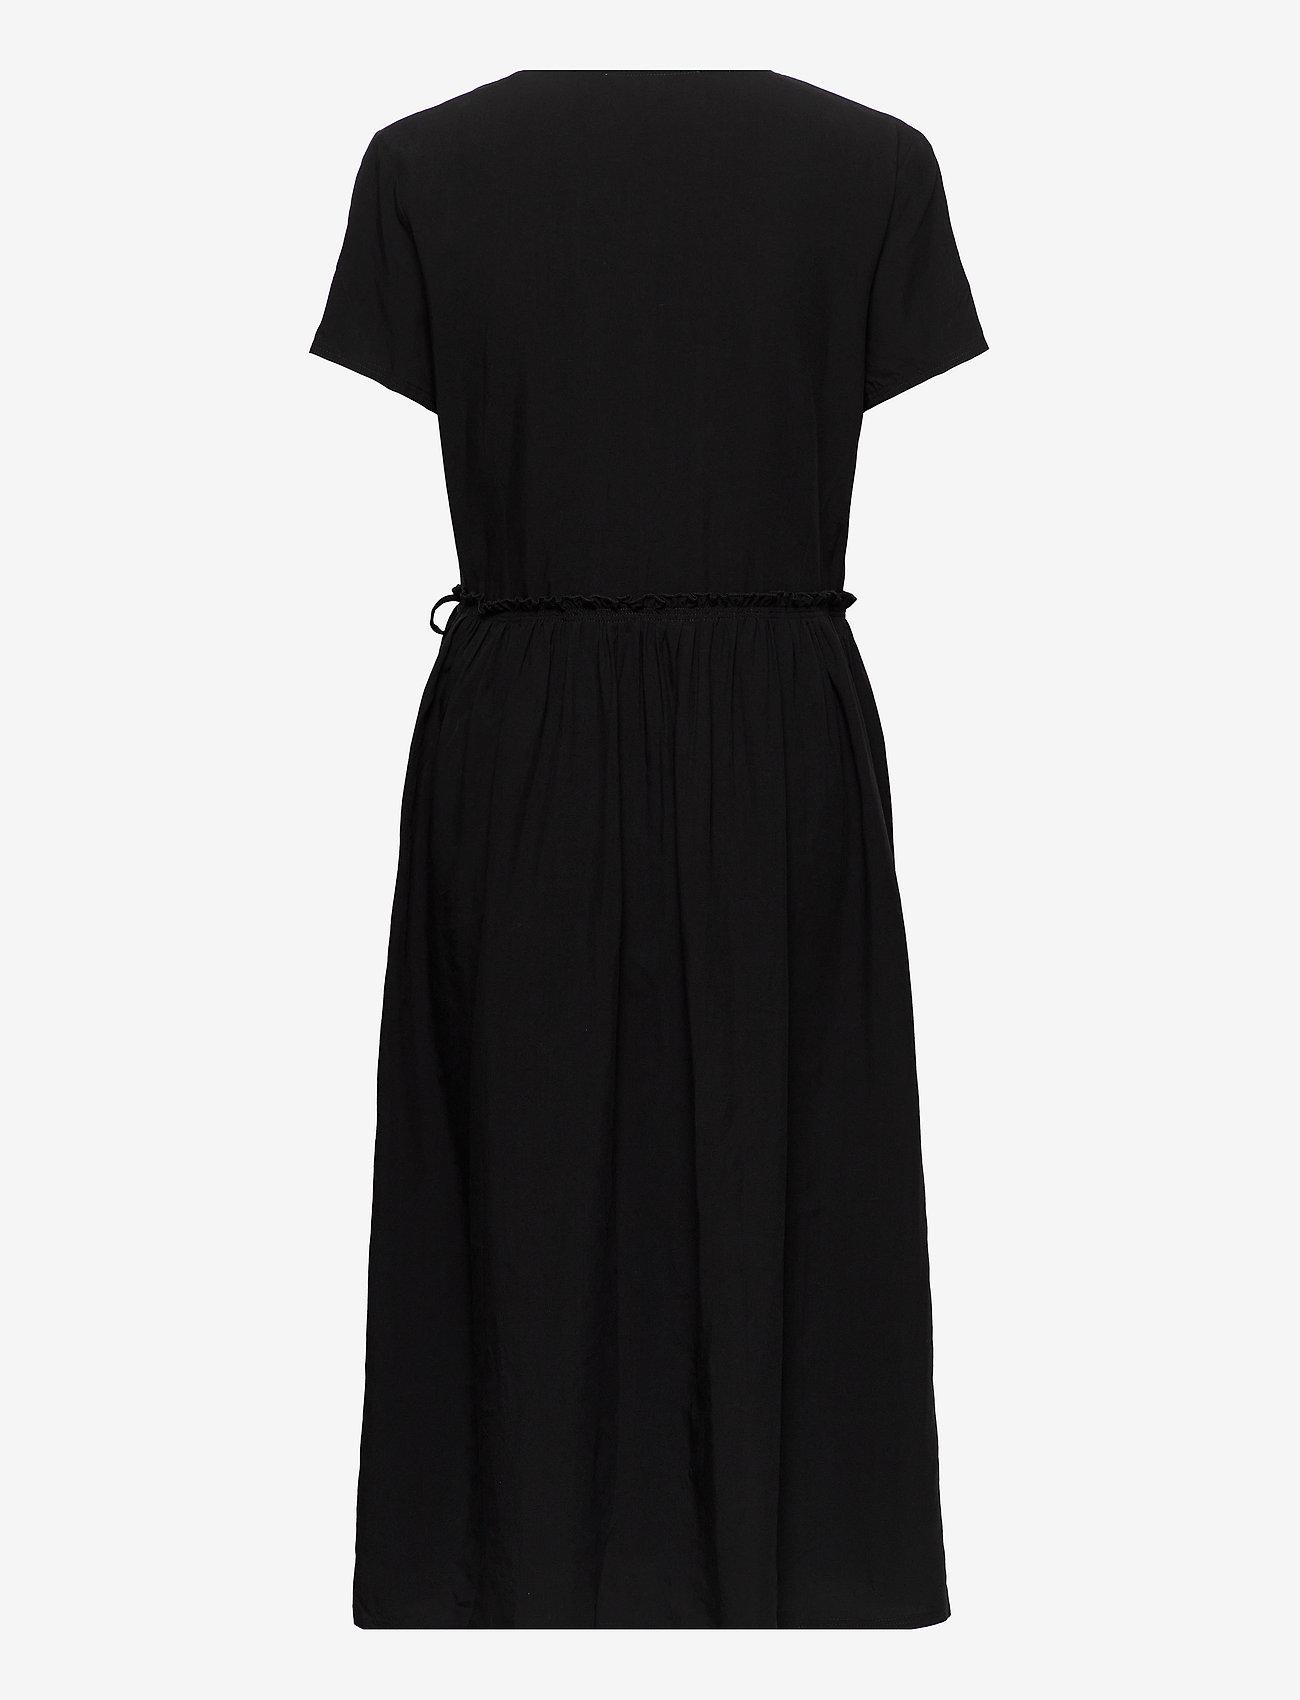 Samsøe Samsøe - Fiona dress 12686 - sommerkjoler - black - 1